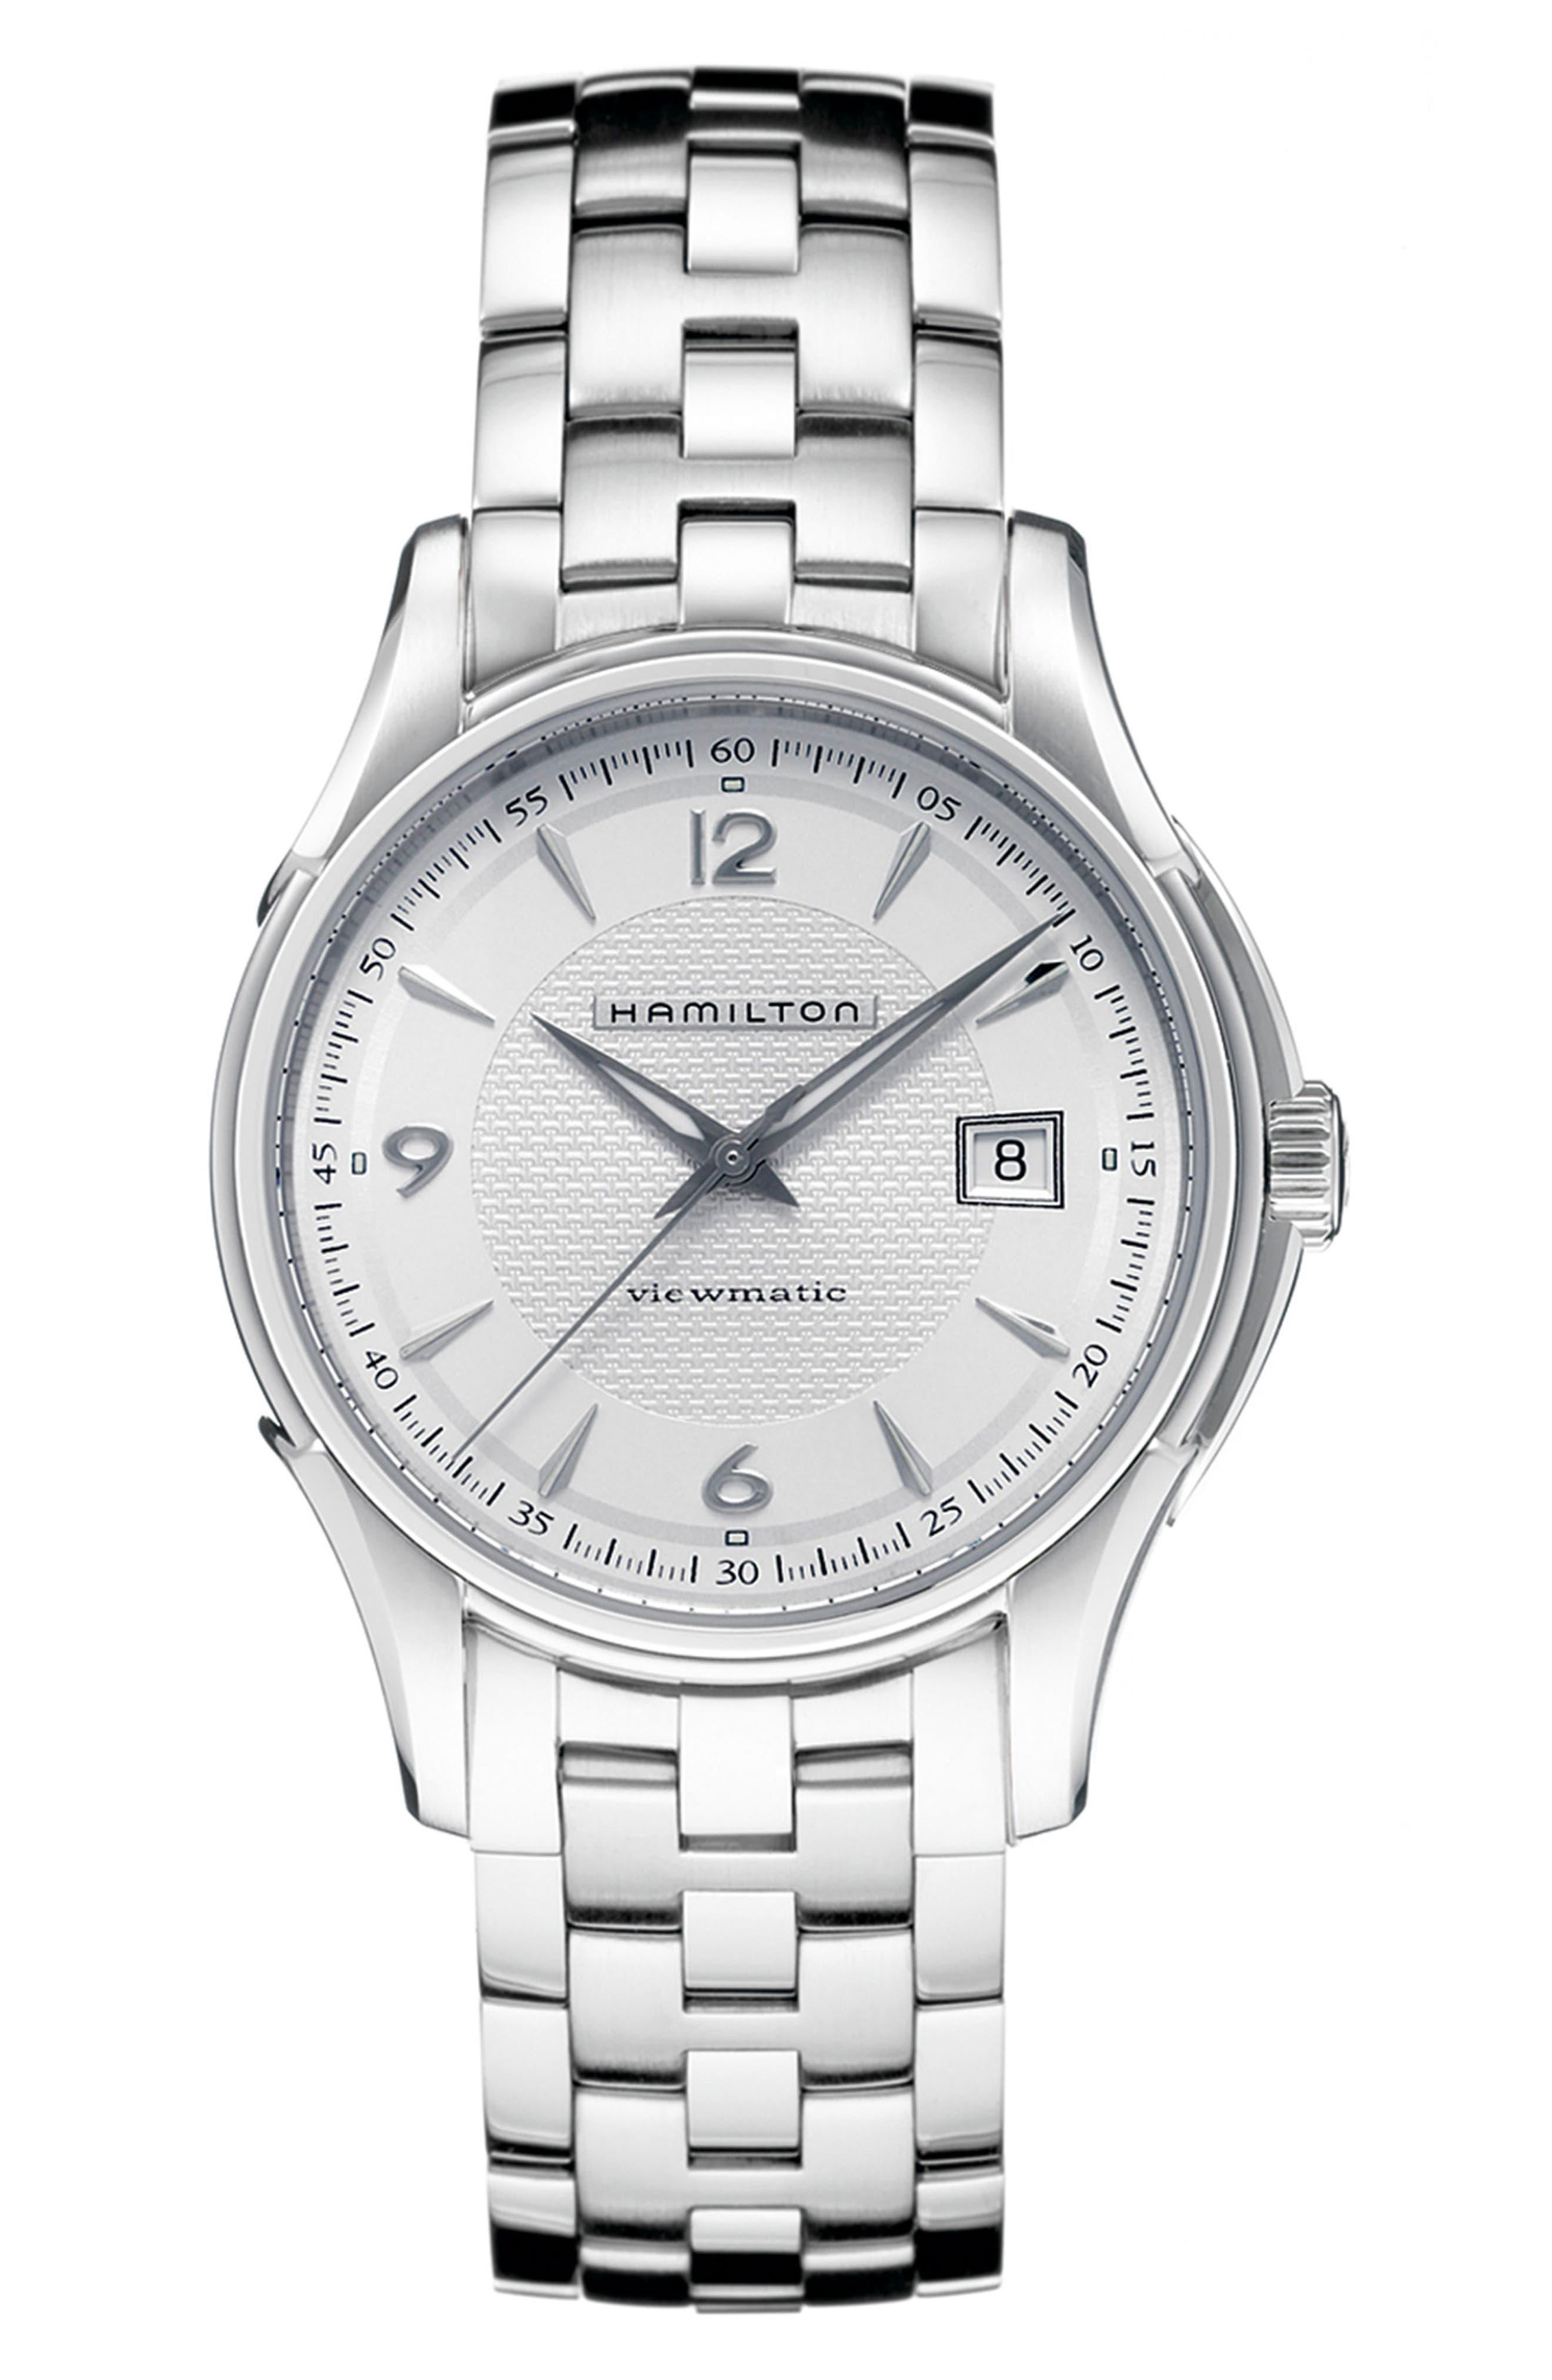 Main Image - Hamilton Jazzmaster Viewmatic Auto Bracelet Watch, 40mm